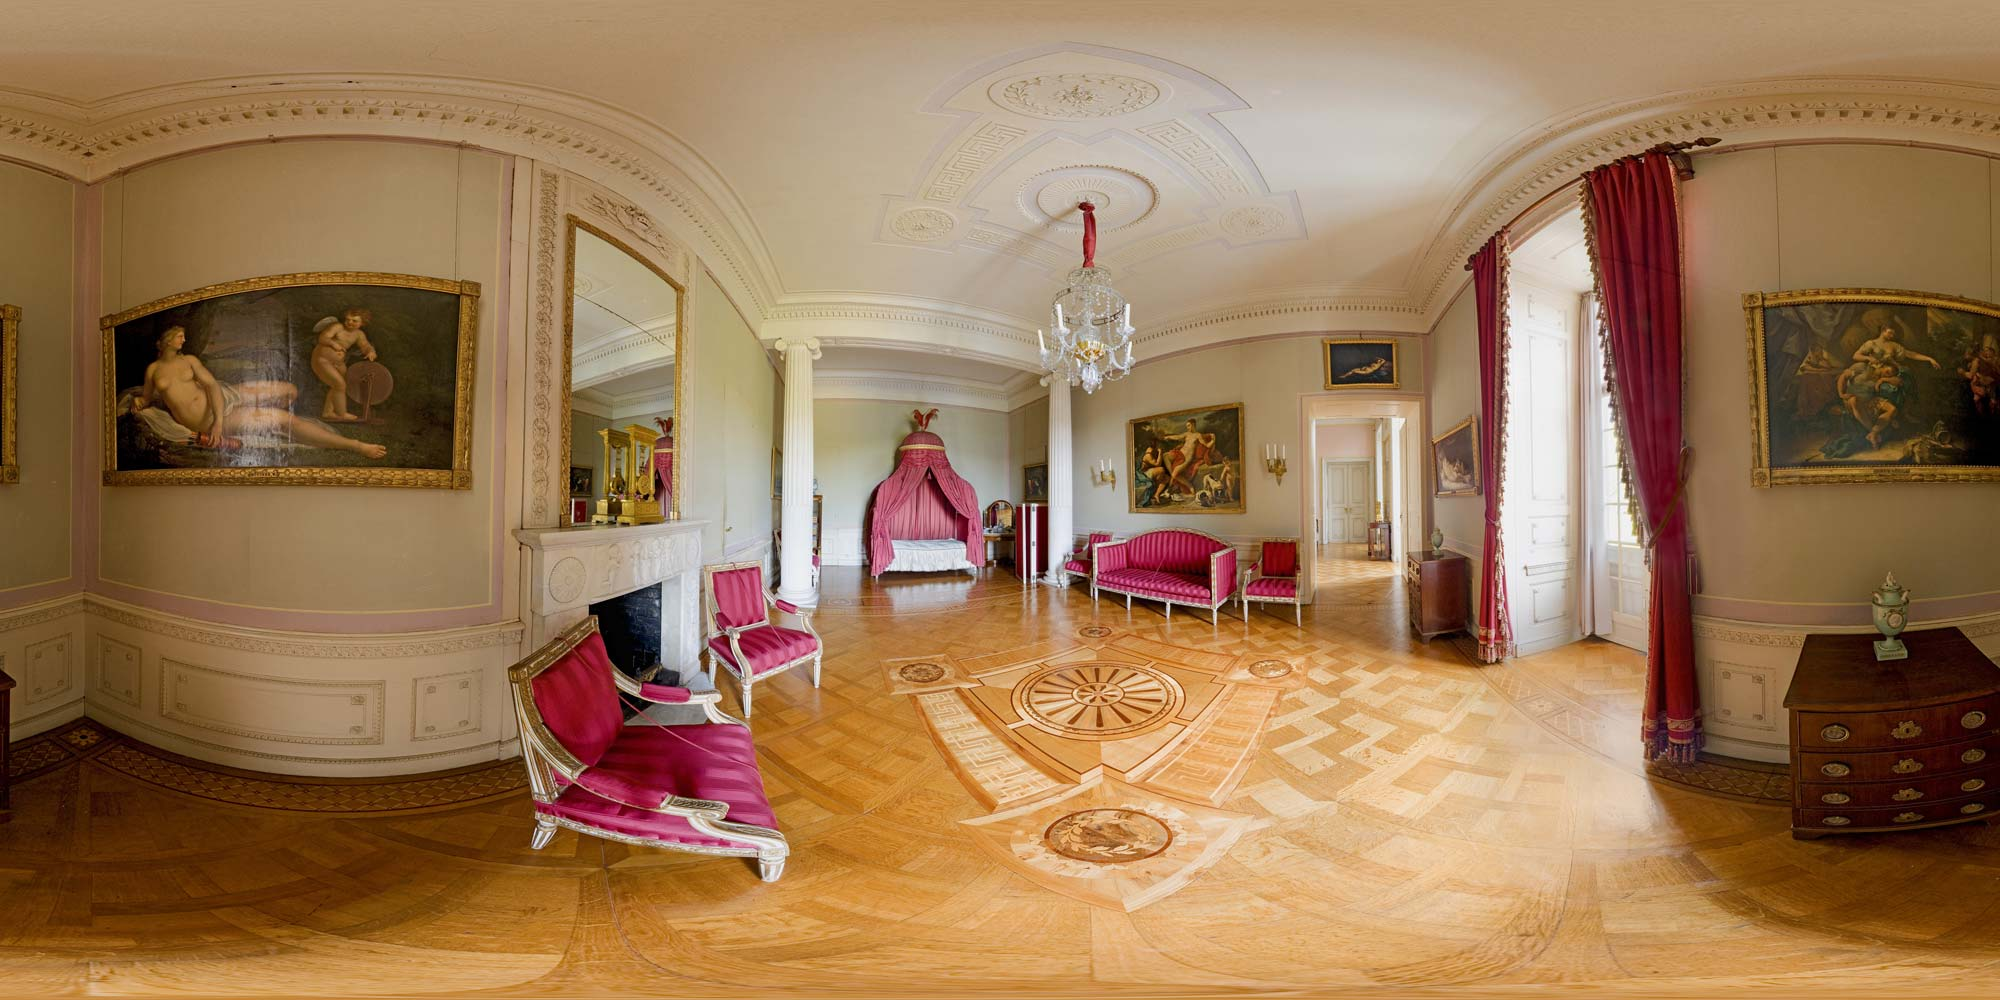 kubische panoramen panorama foto kassel schloss wilhelmsh he raum 108. Black Bedroom Furniture Sets. Home Design Ideas